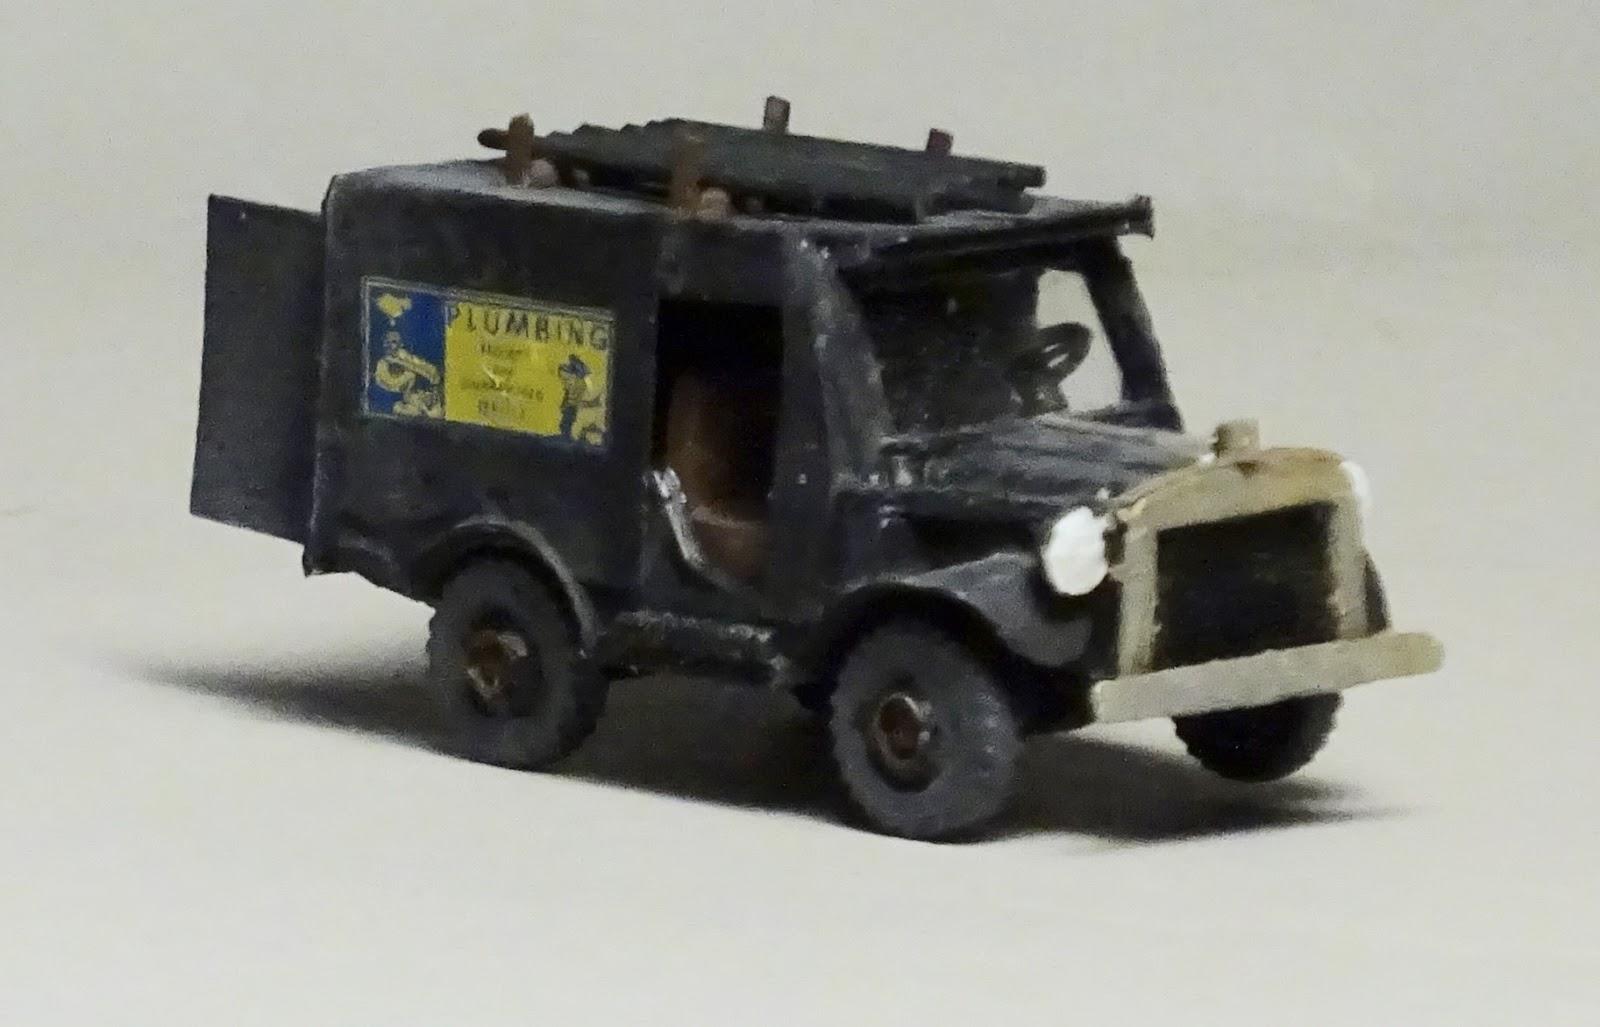 Model Railroad Minutiae: Vintage´plumbing truck model